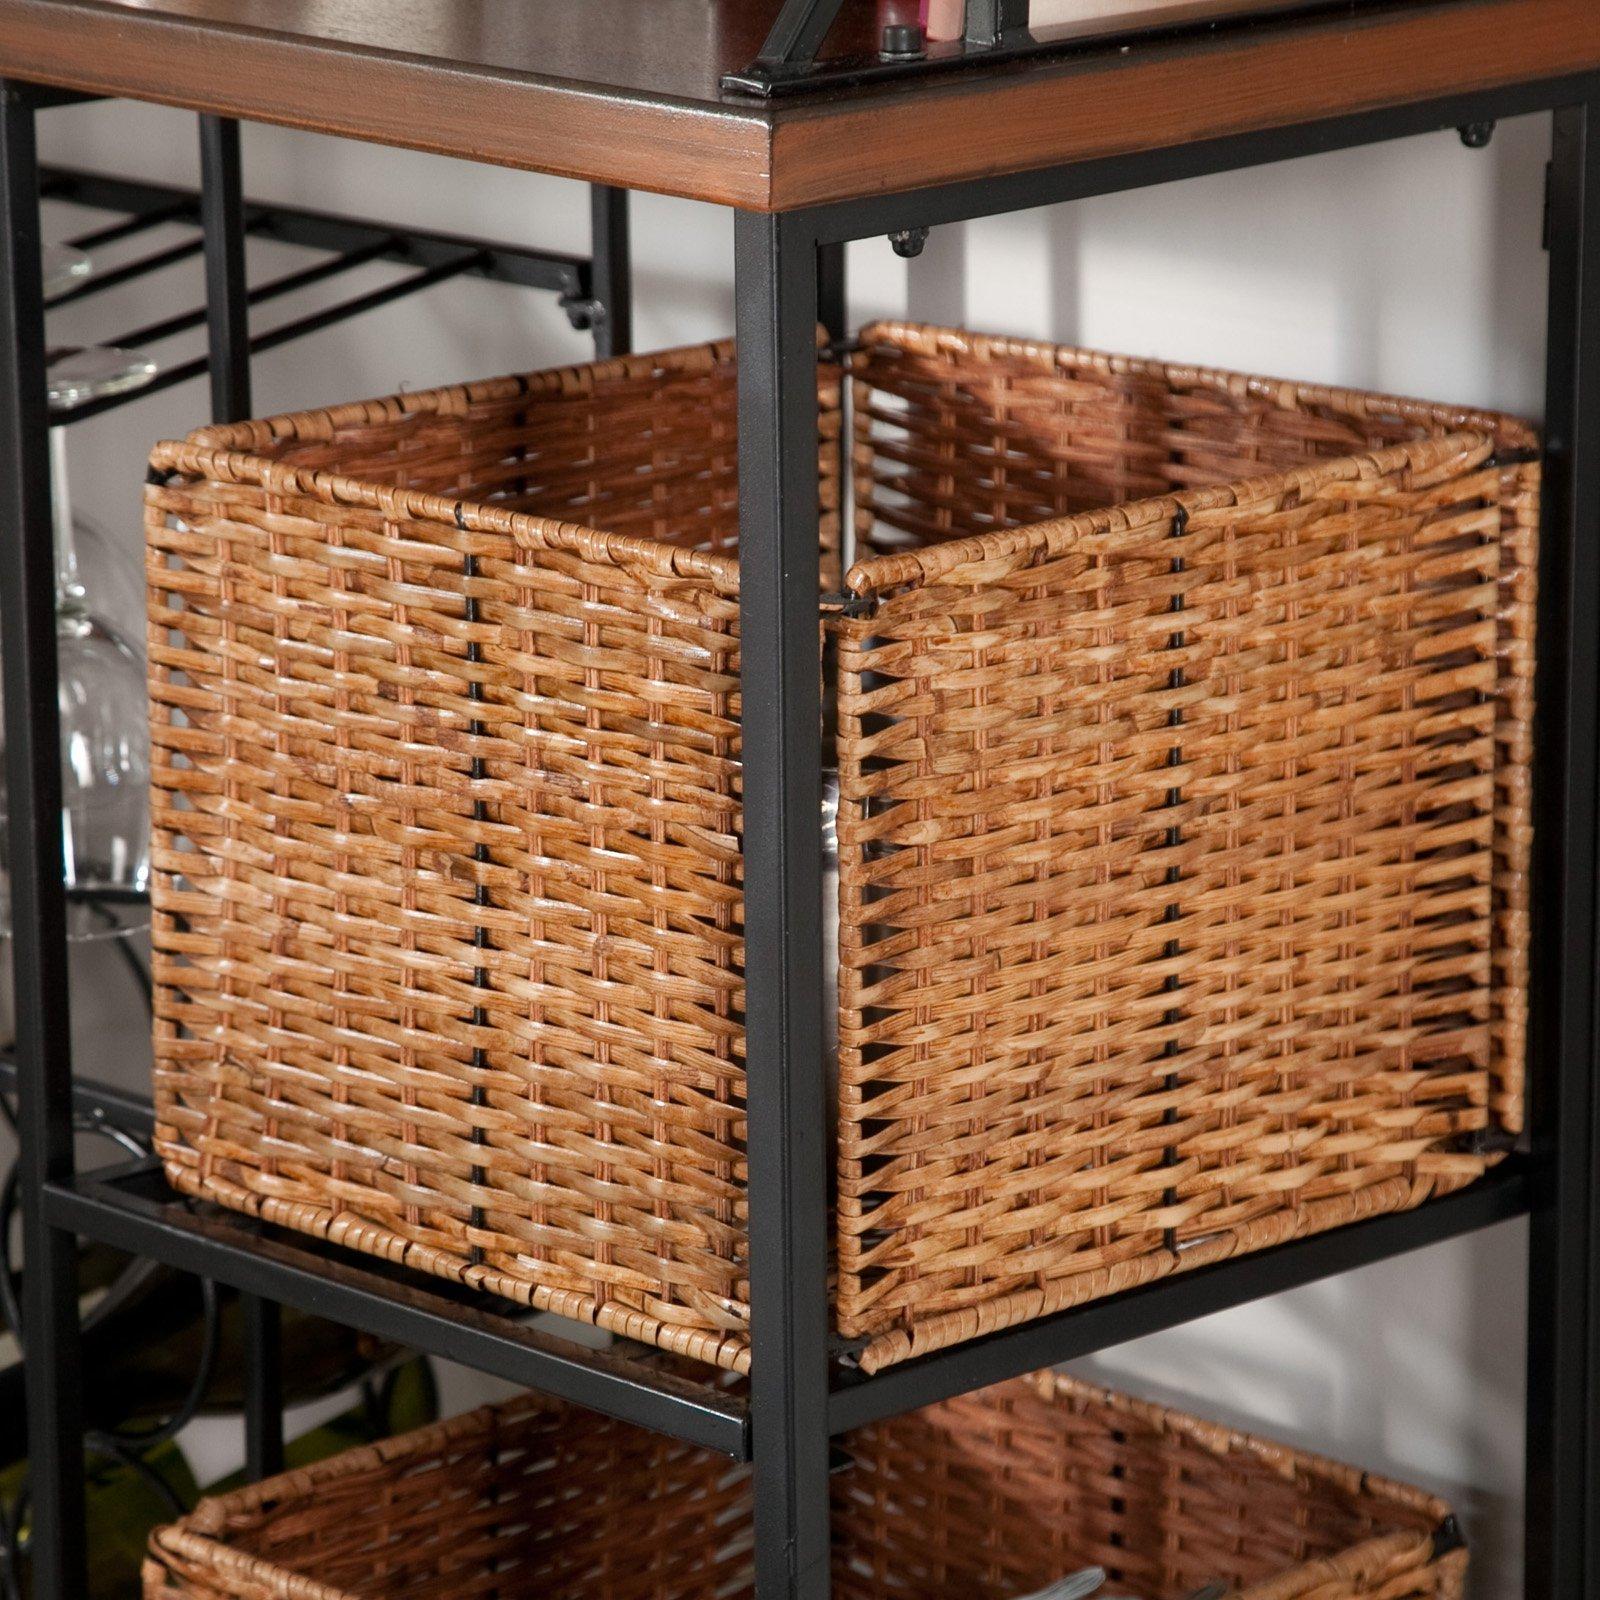 Belham Living Solano Bakers Rack with Baskets by Belham Living (Image #6)